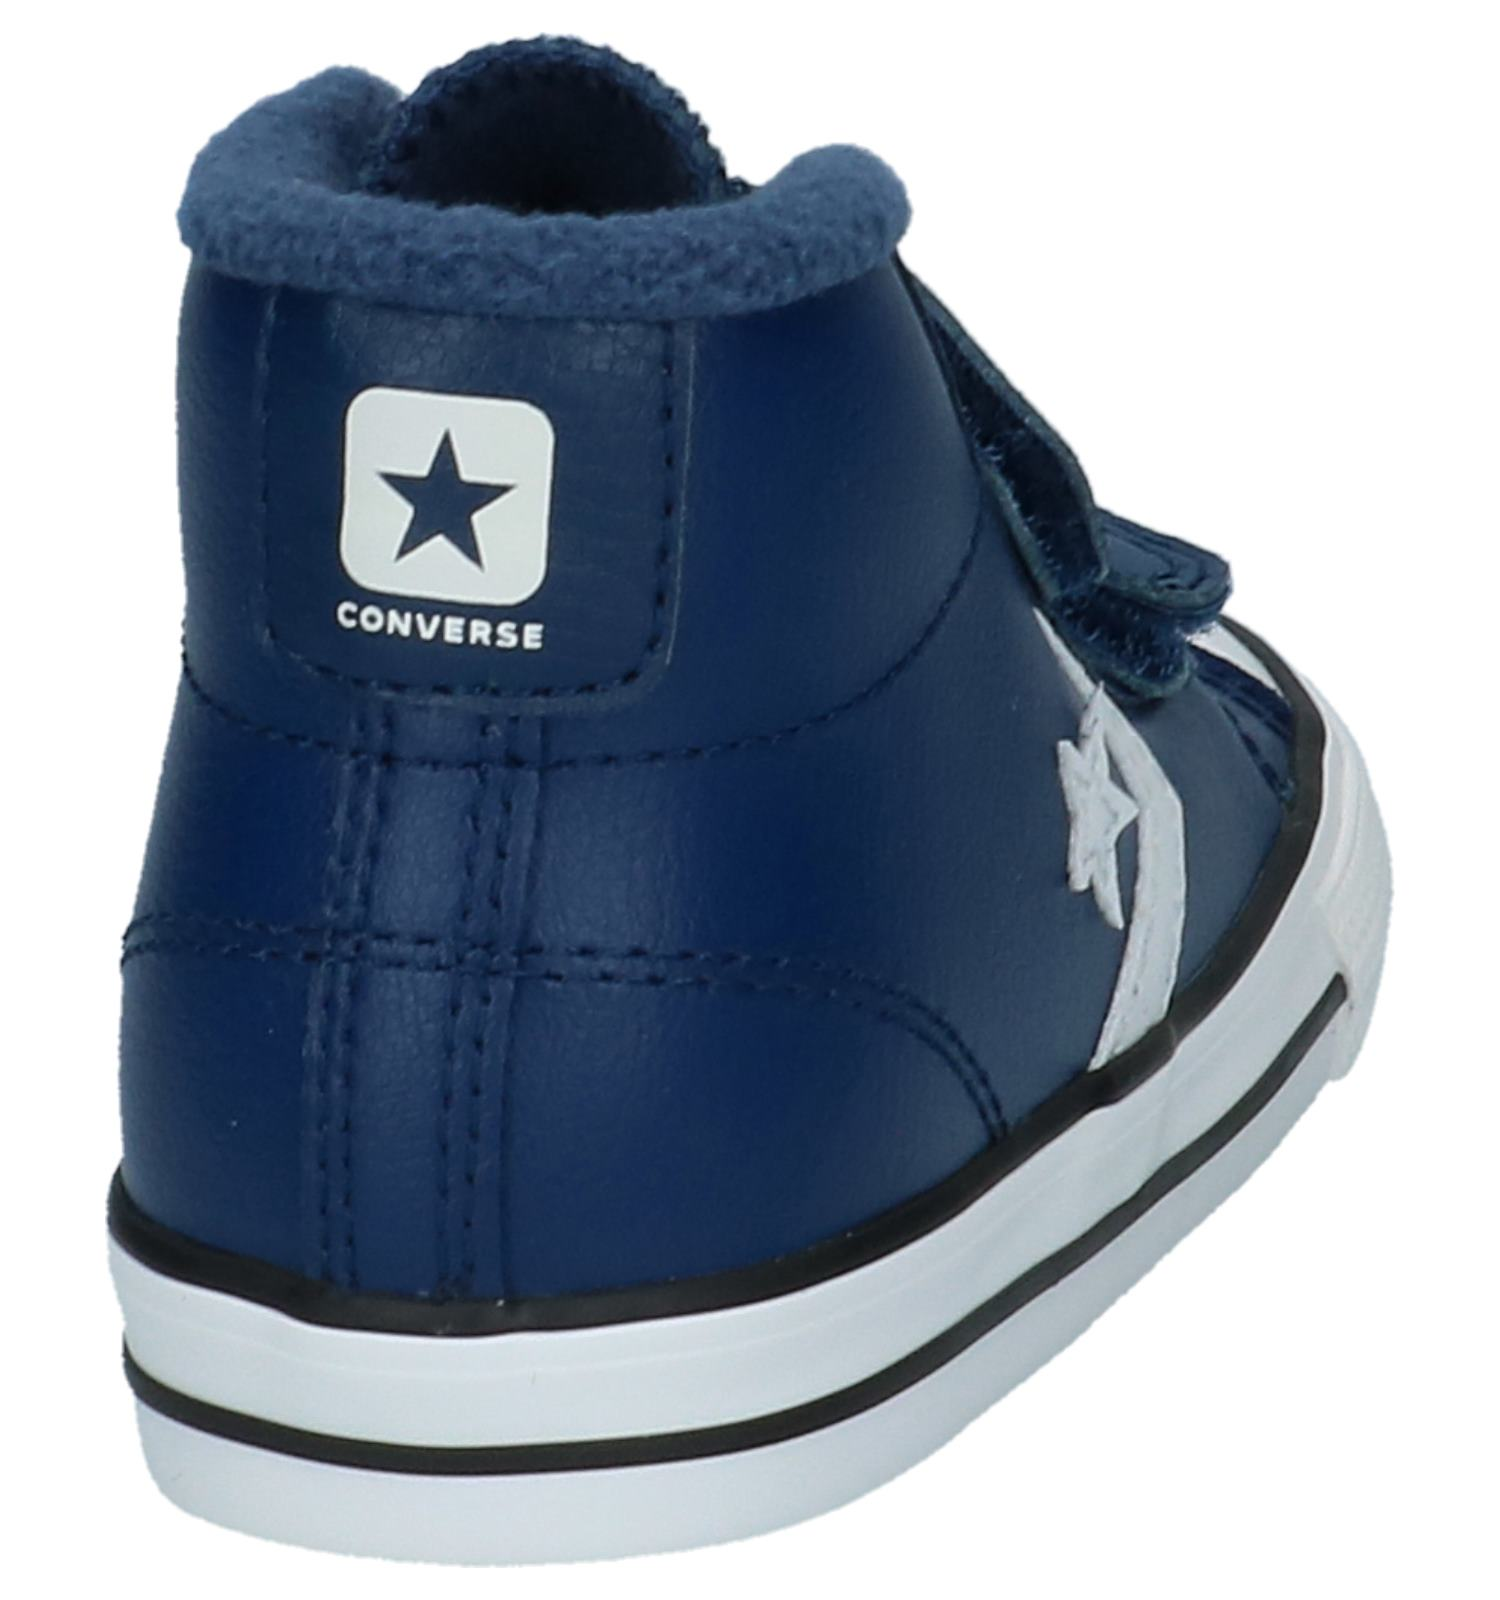 5014441e76d Blauwe Sneakers Converse Star Player 2V Mid | TORFS.BE | Gratis verzend en  retour